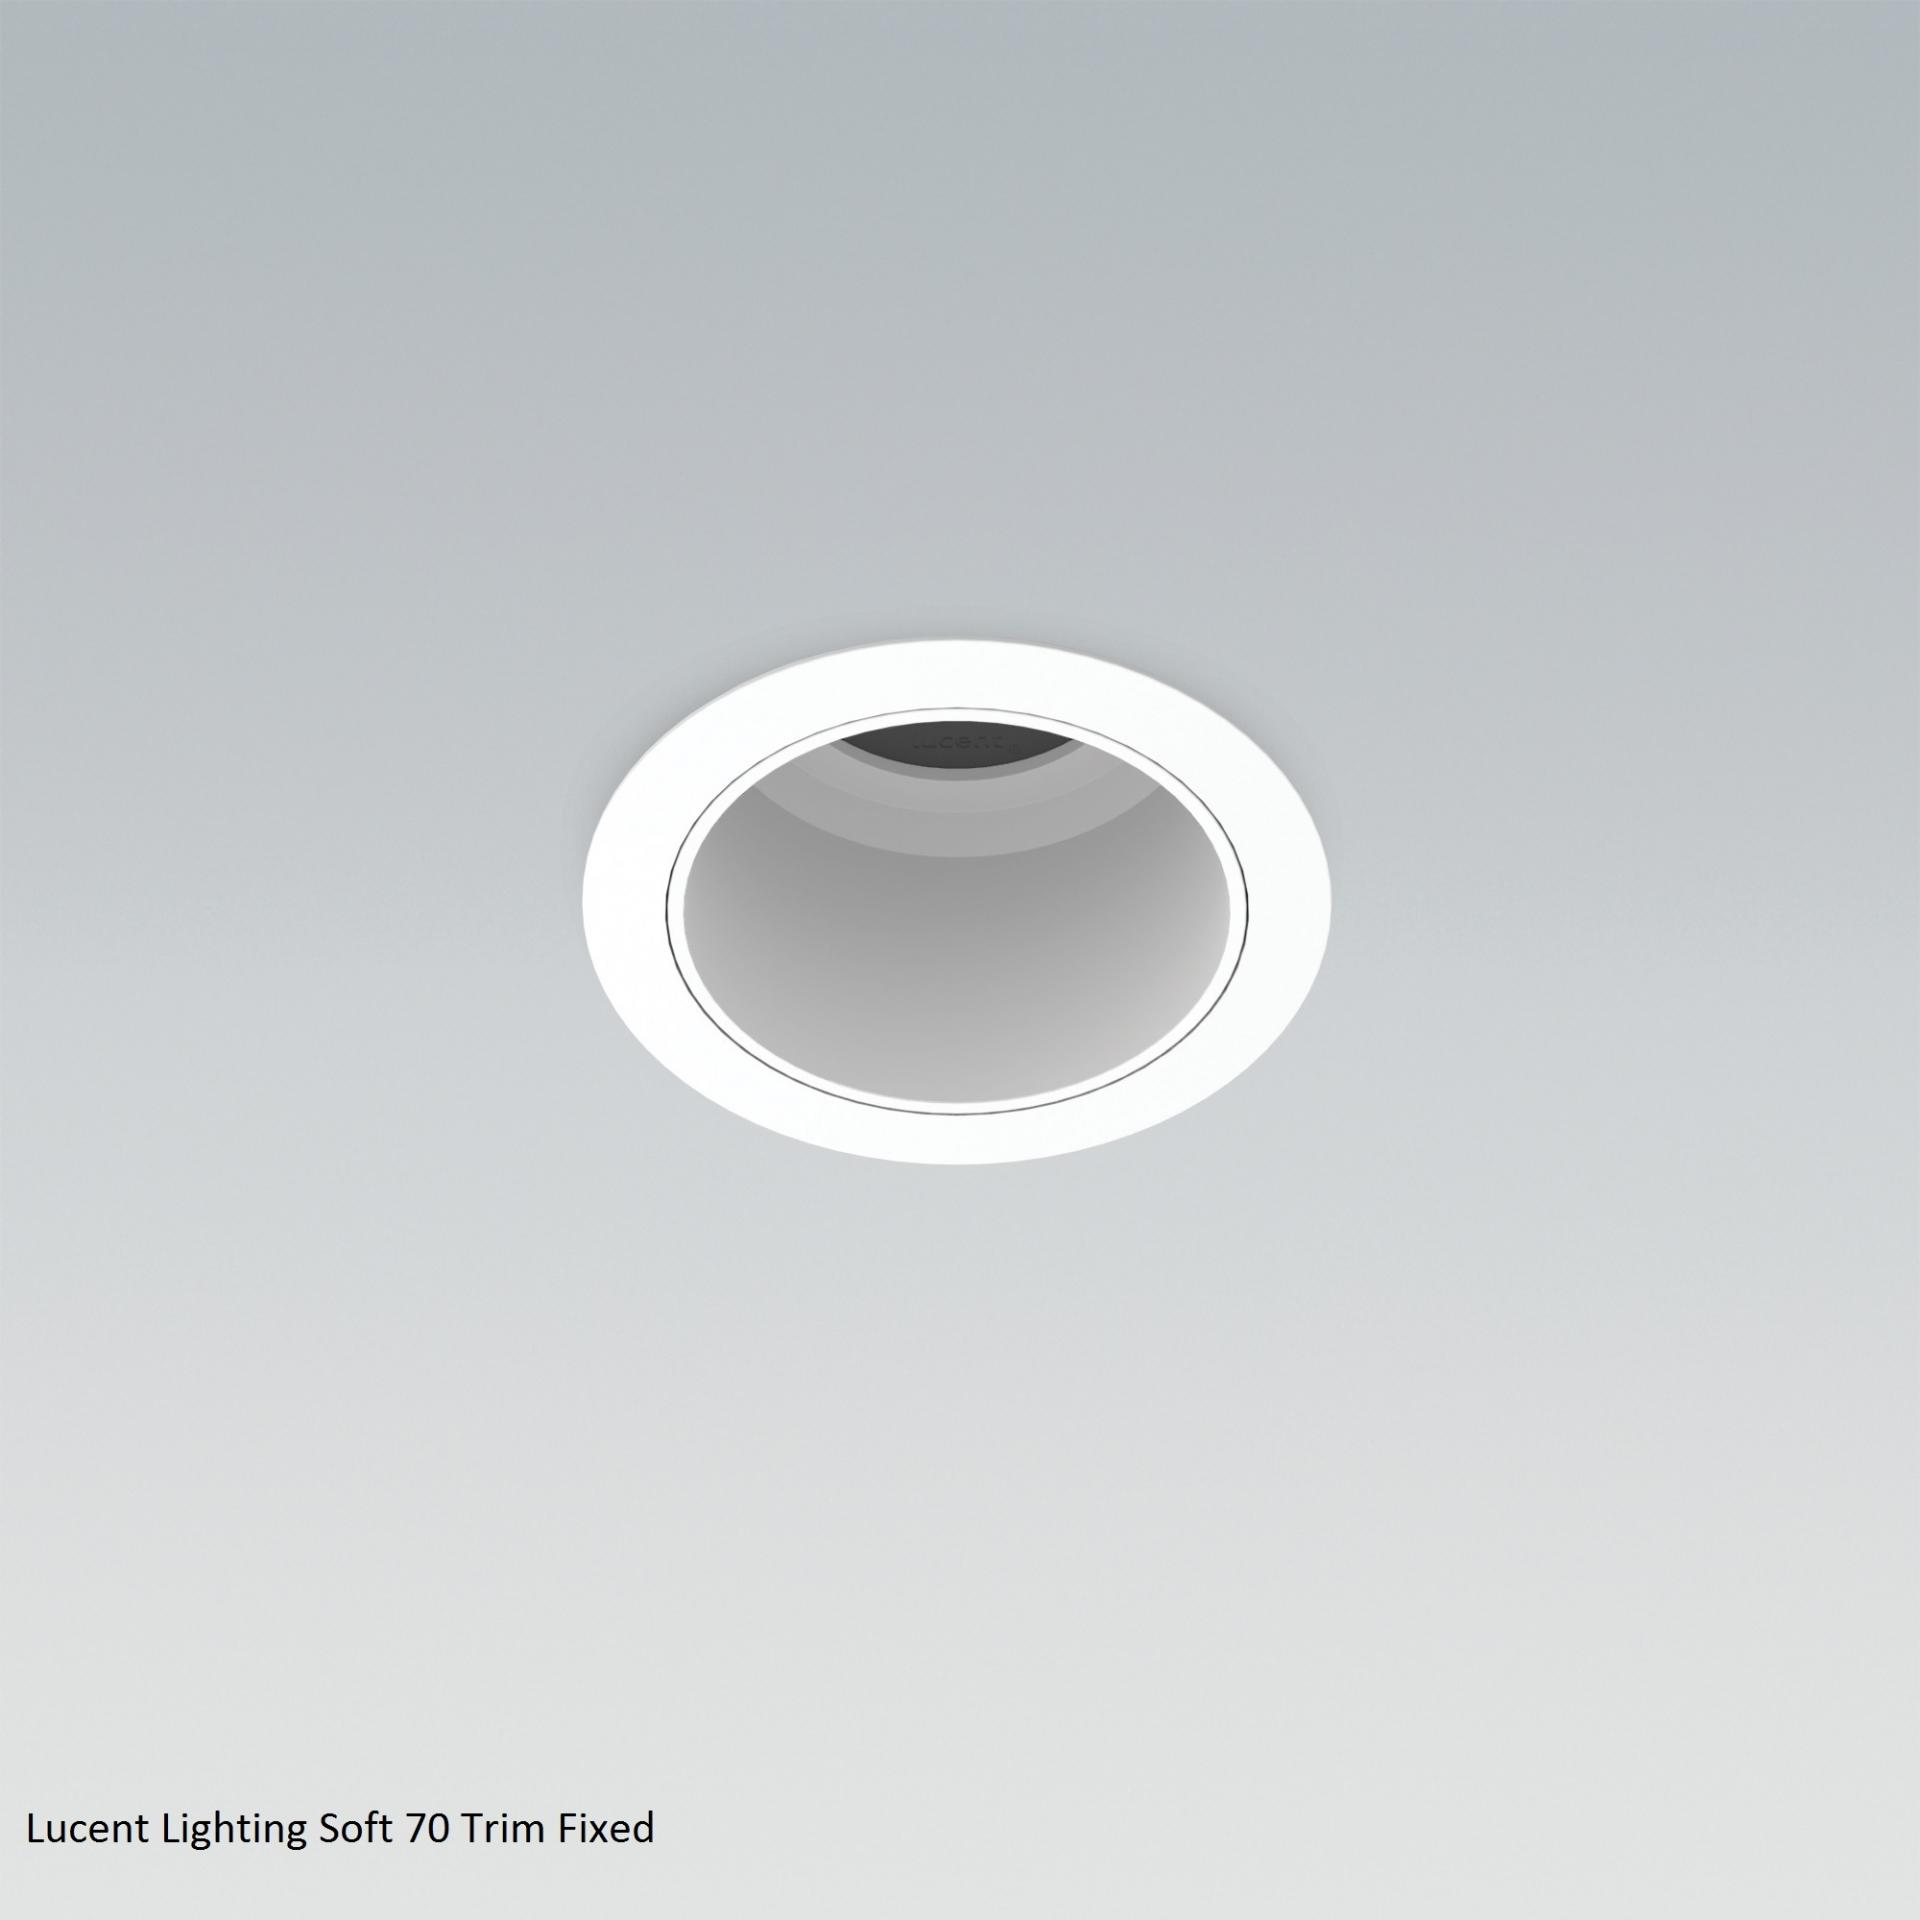 lucent-lighting-soft-70-trim-fixed1552905061